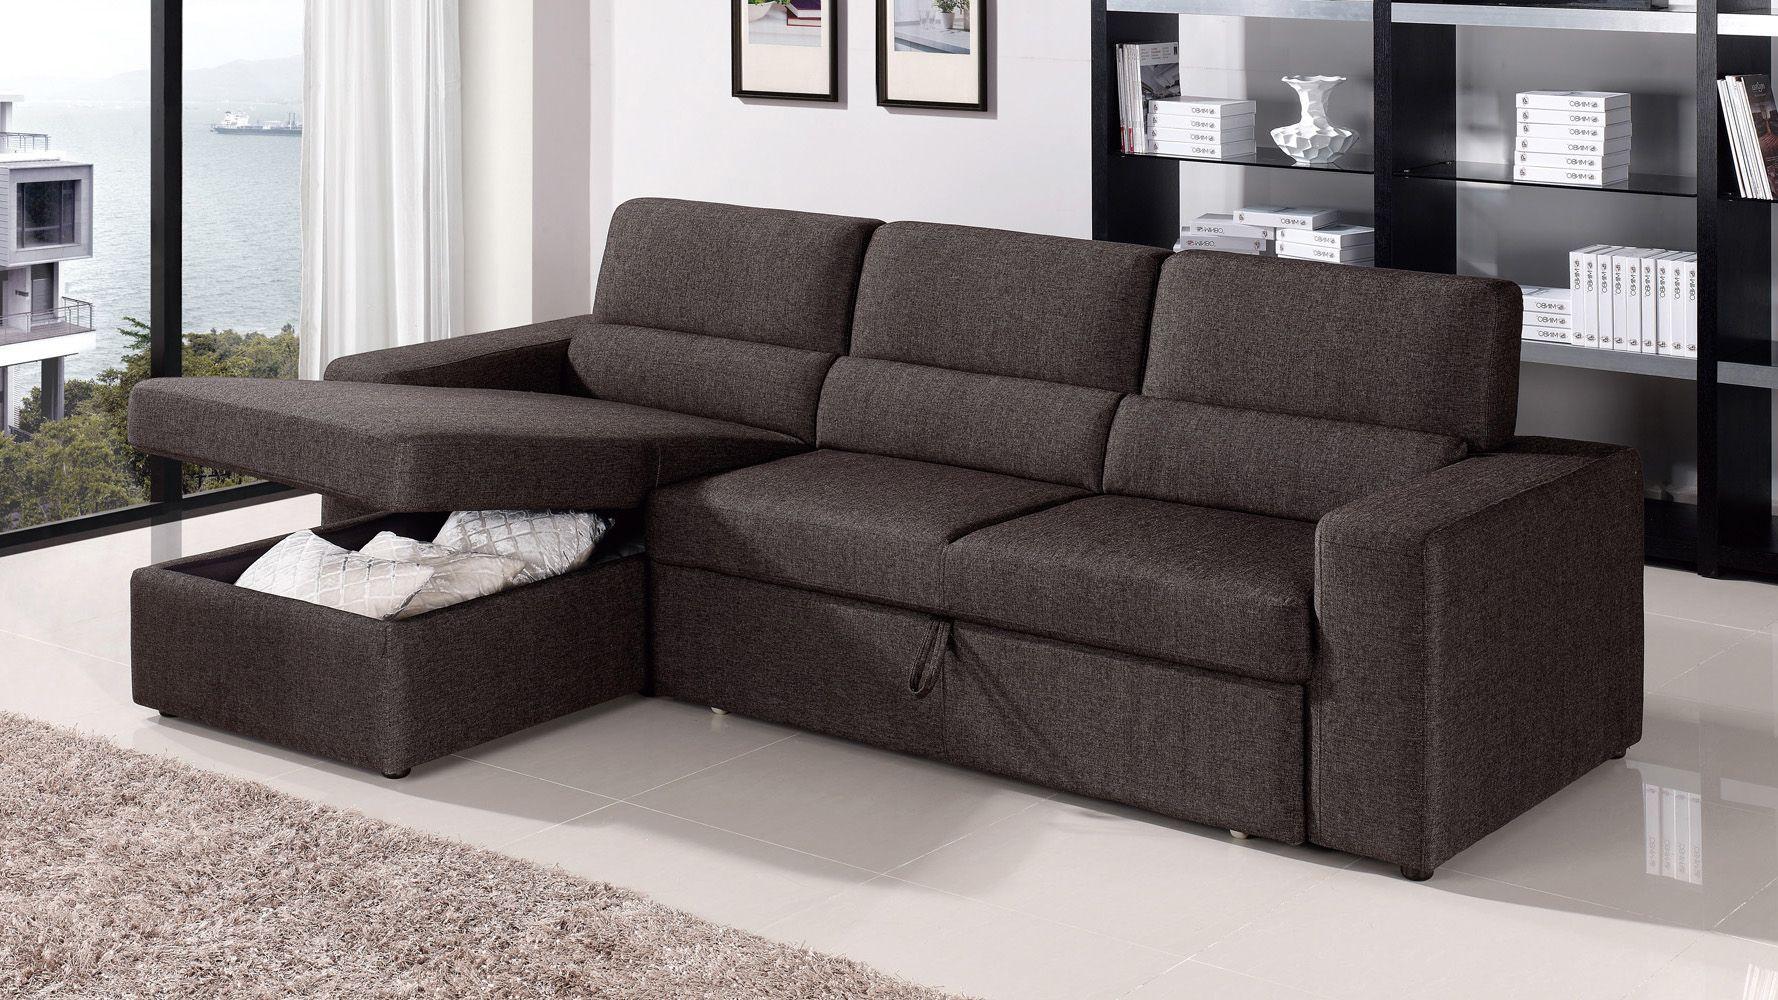 Types Of Sleeper Sofa Http Tmidb Pinterest Sofas Small Living And Es